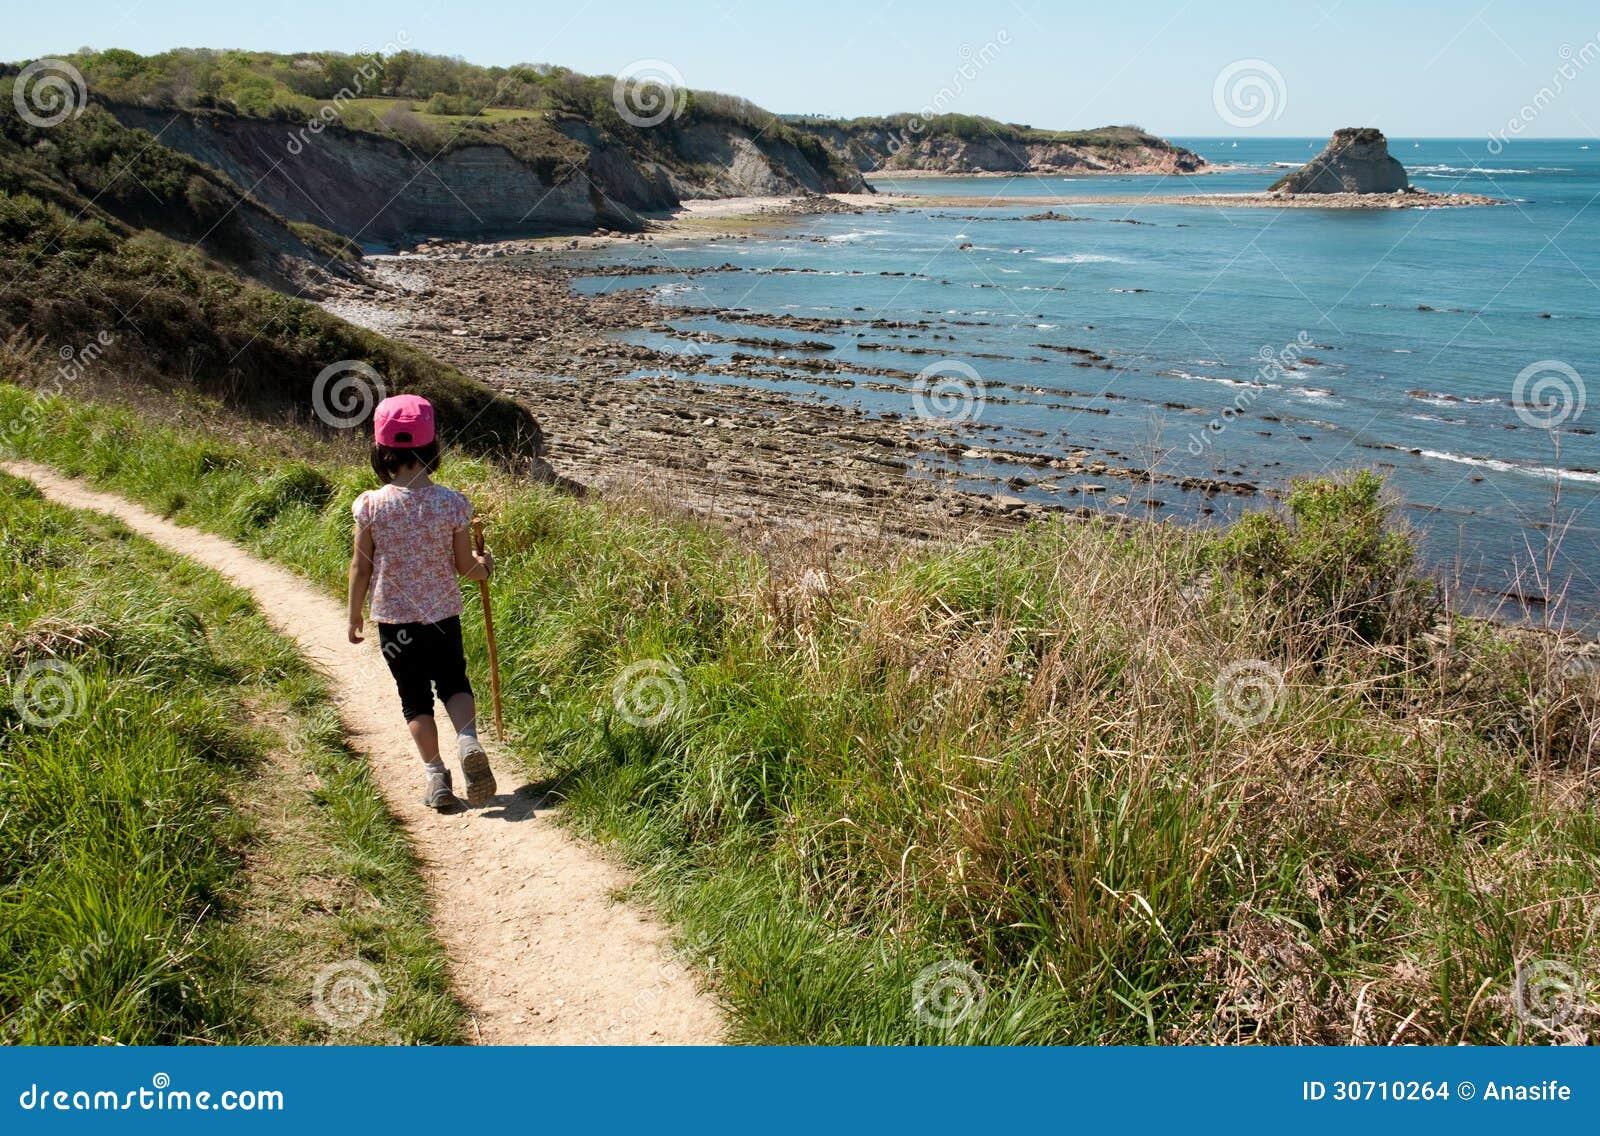 cliff island milf women Mature - 762780 videos mature, granny, milf, mom, mature anal, bbw and much more.